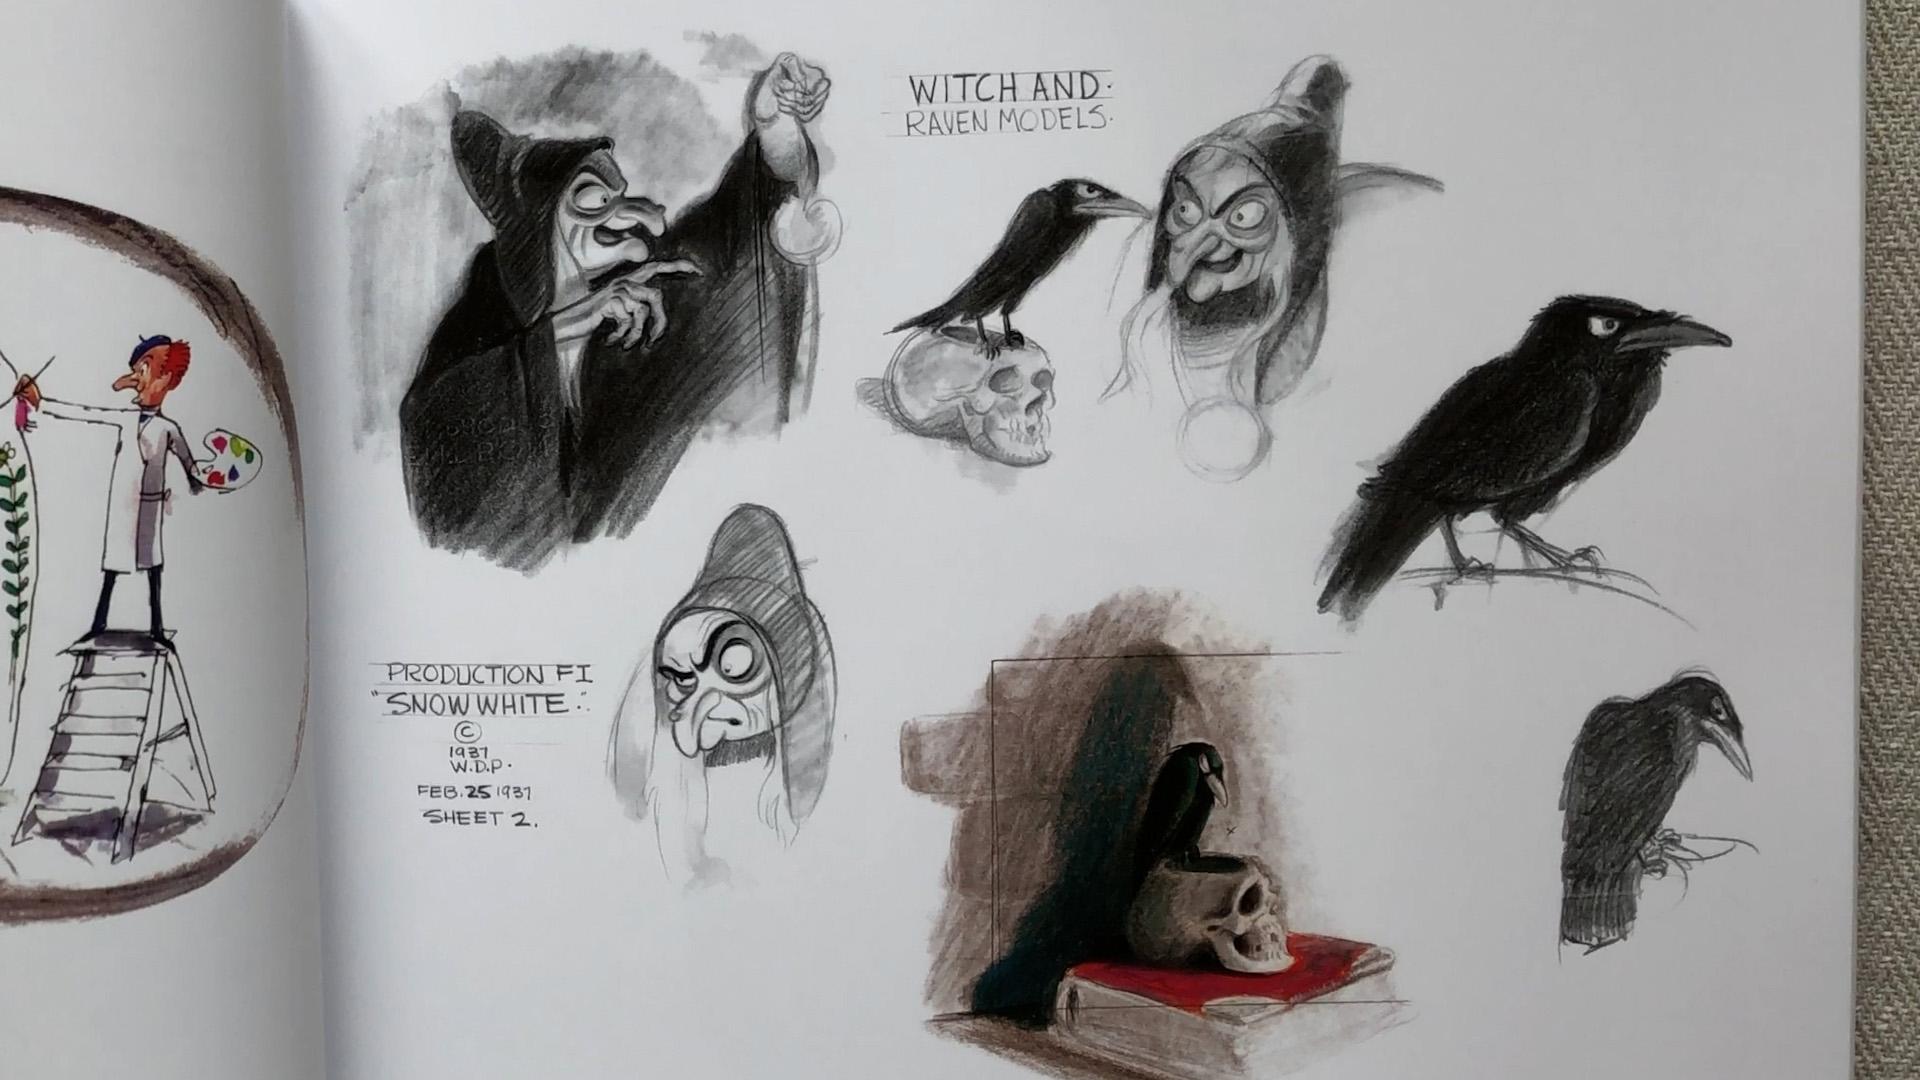 Joe Grant concept design Snow White Witch and Raven